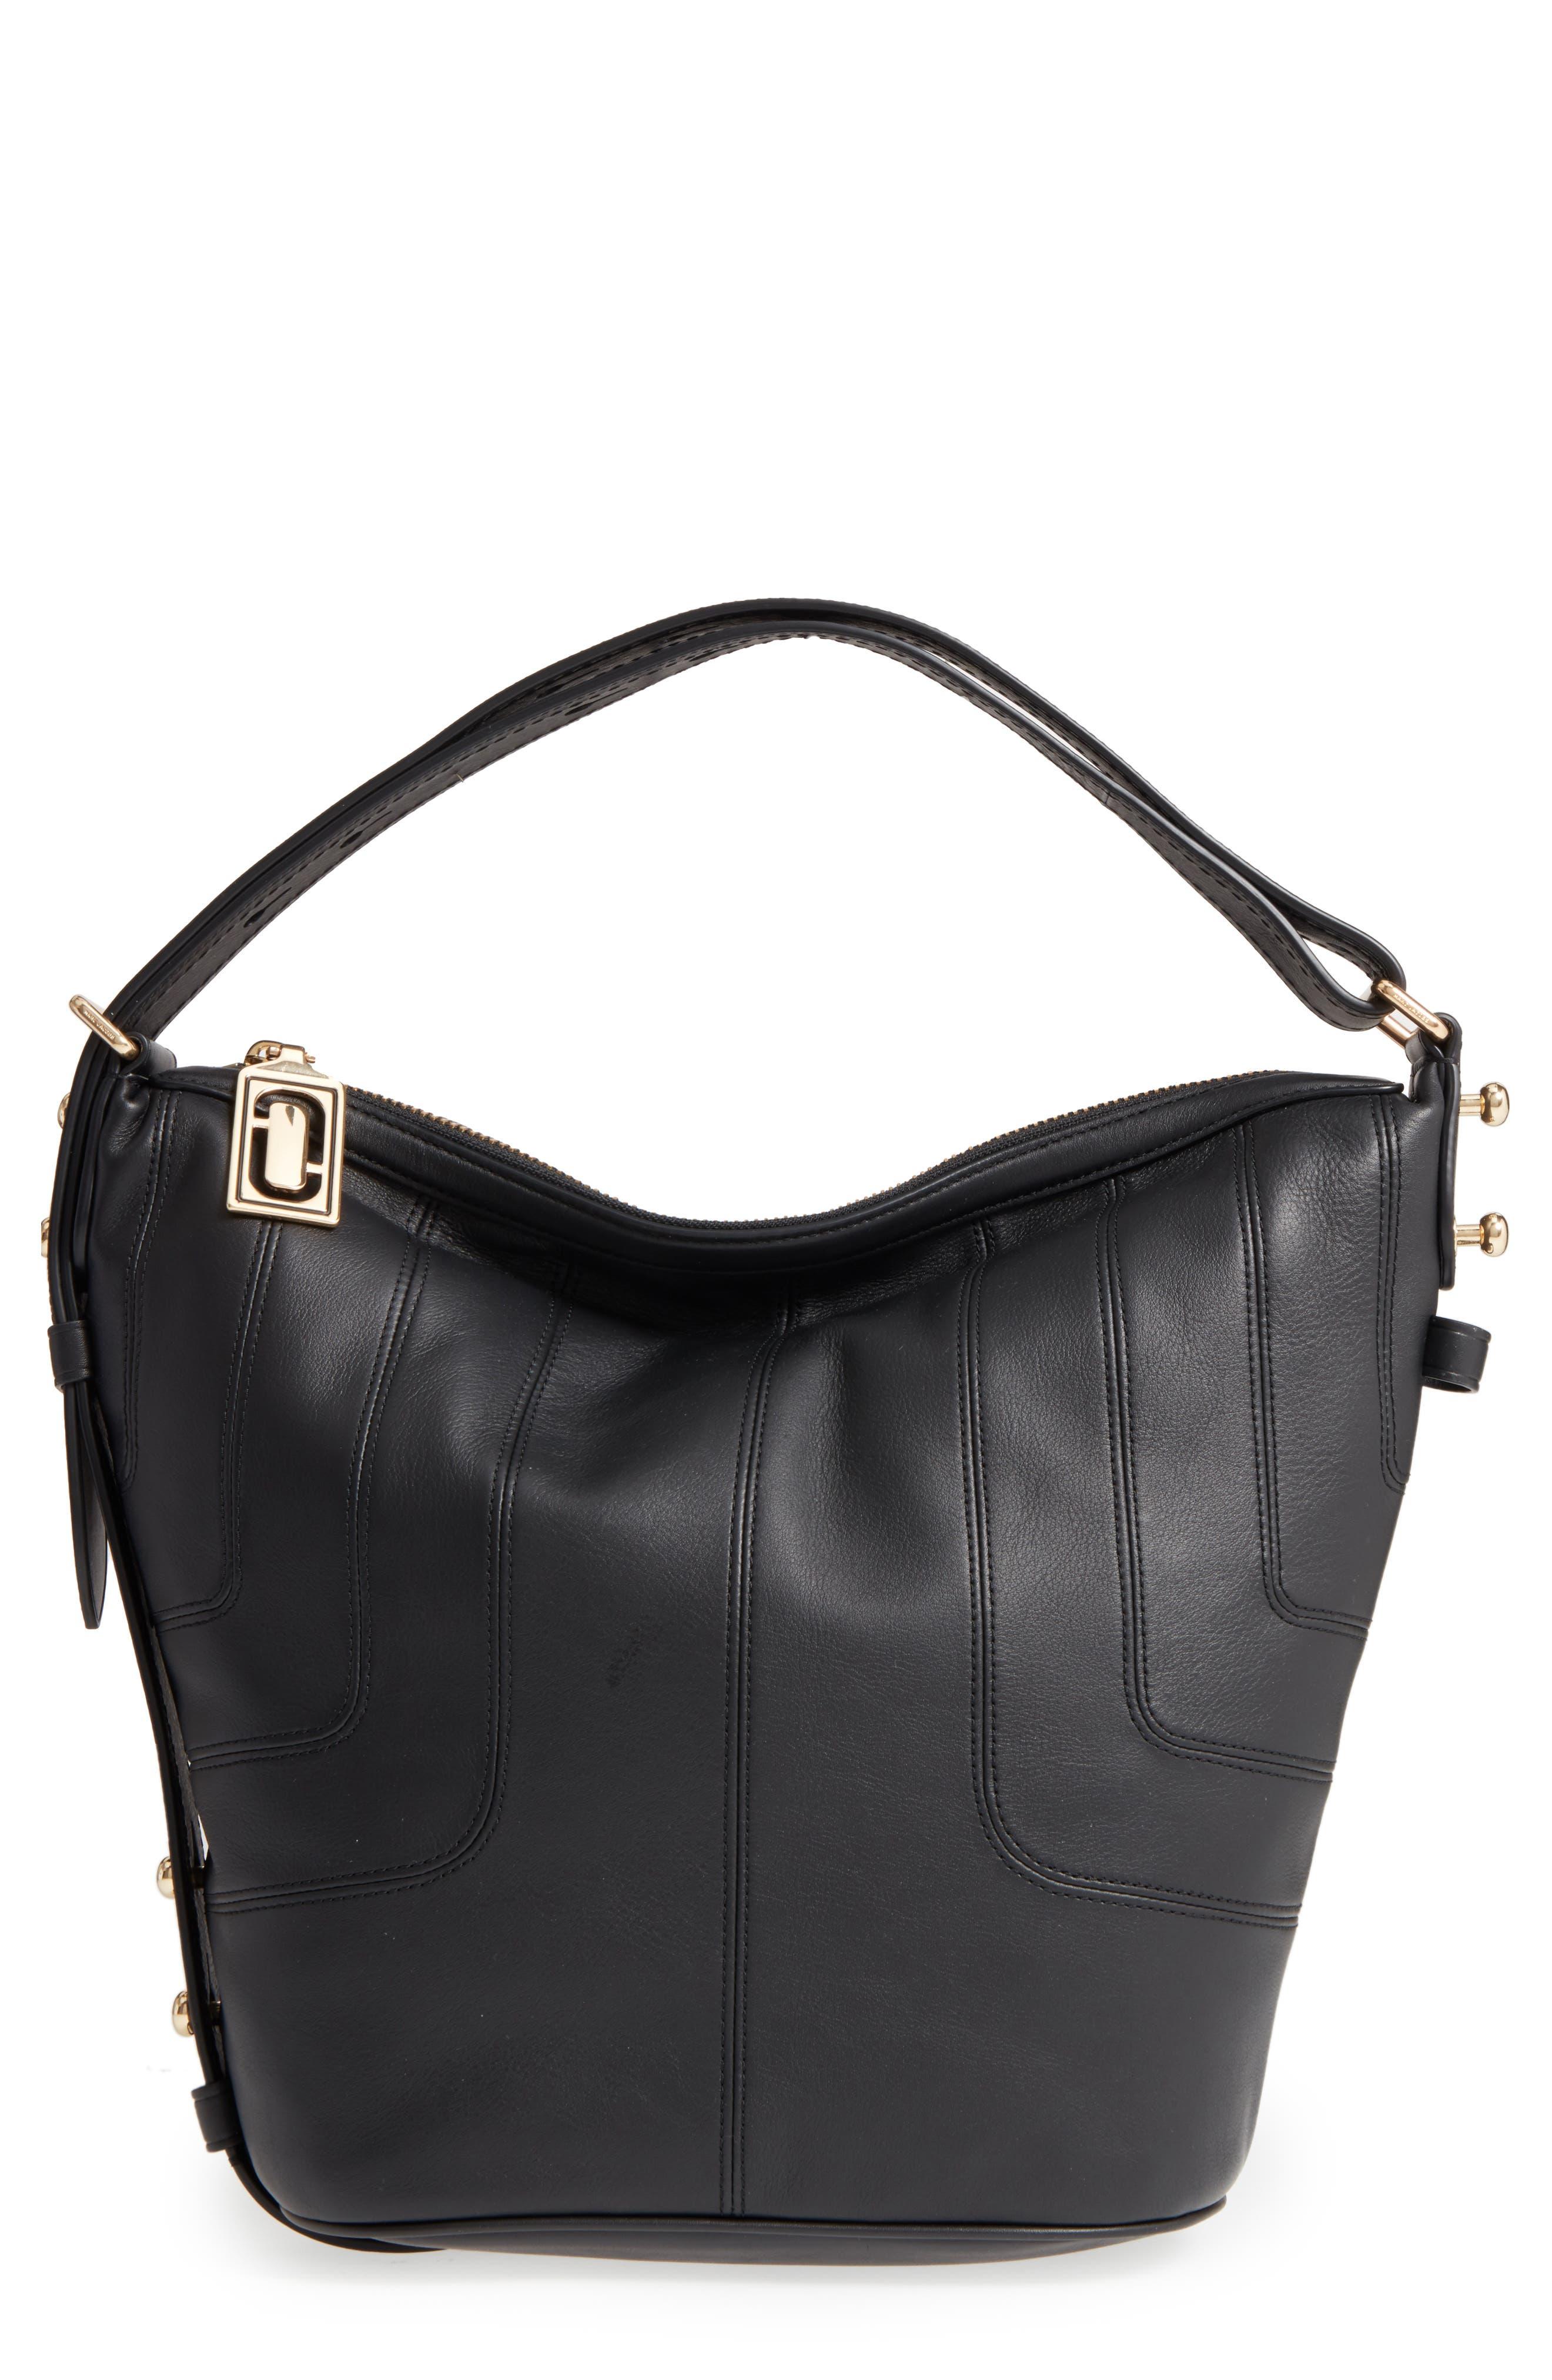 MARC JACOBS The Sling Mod Leather Hobo/Crossbody/Sling Bag